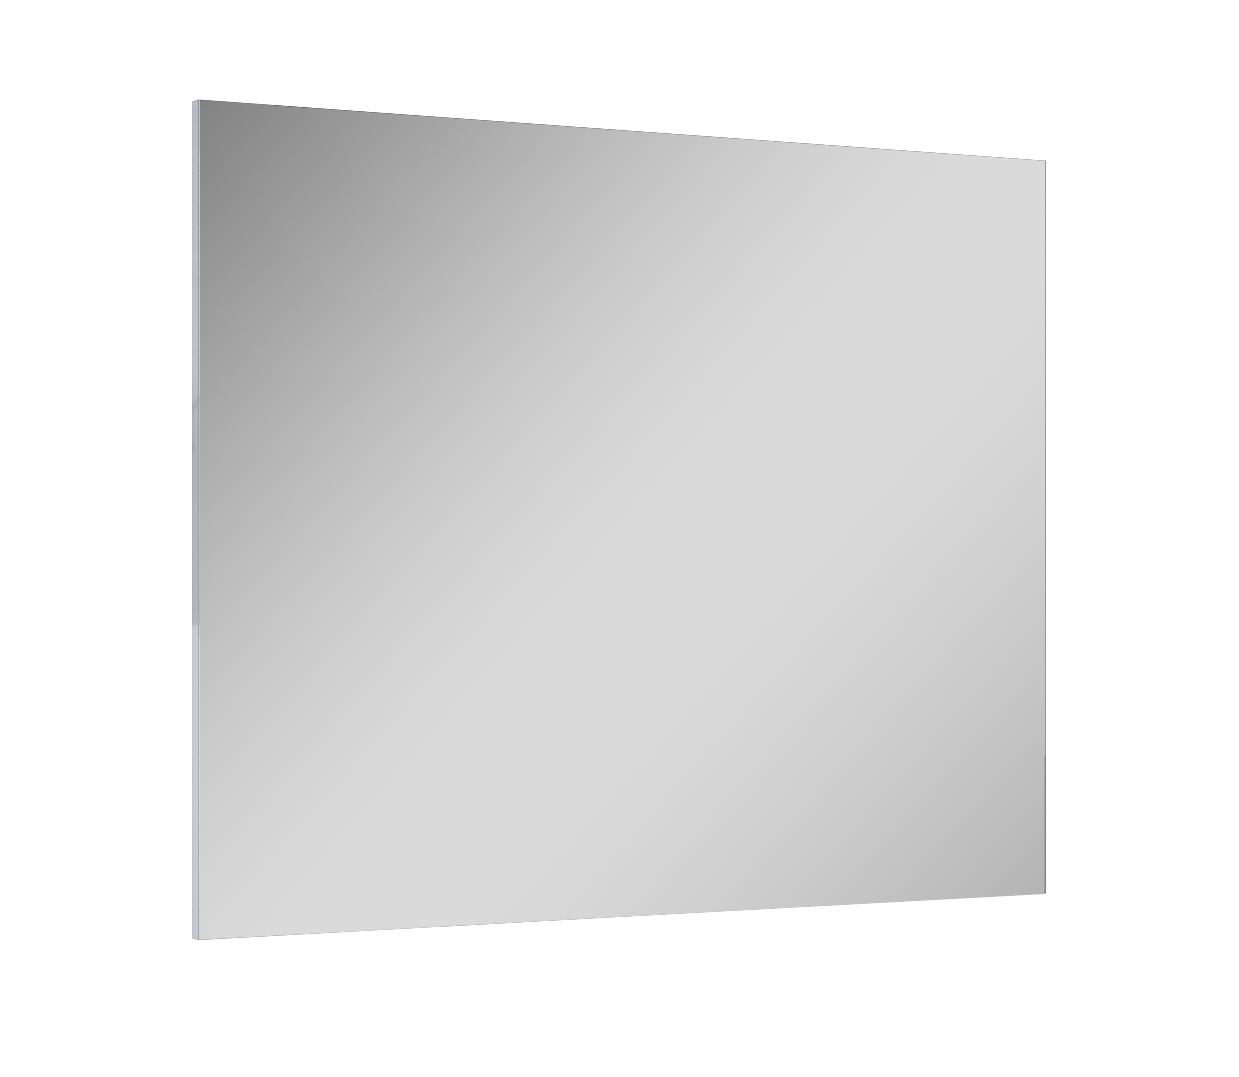 Lustro Elita Na płycie SOTE 100/80cm 165804